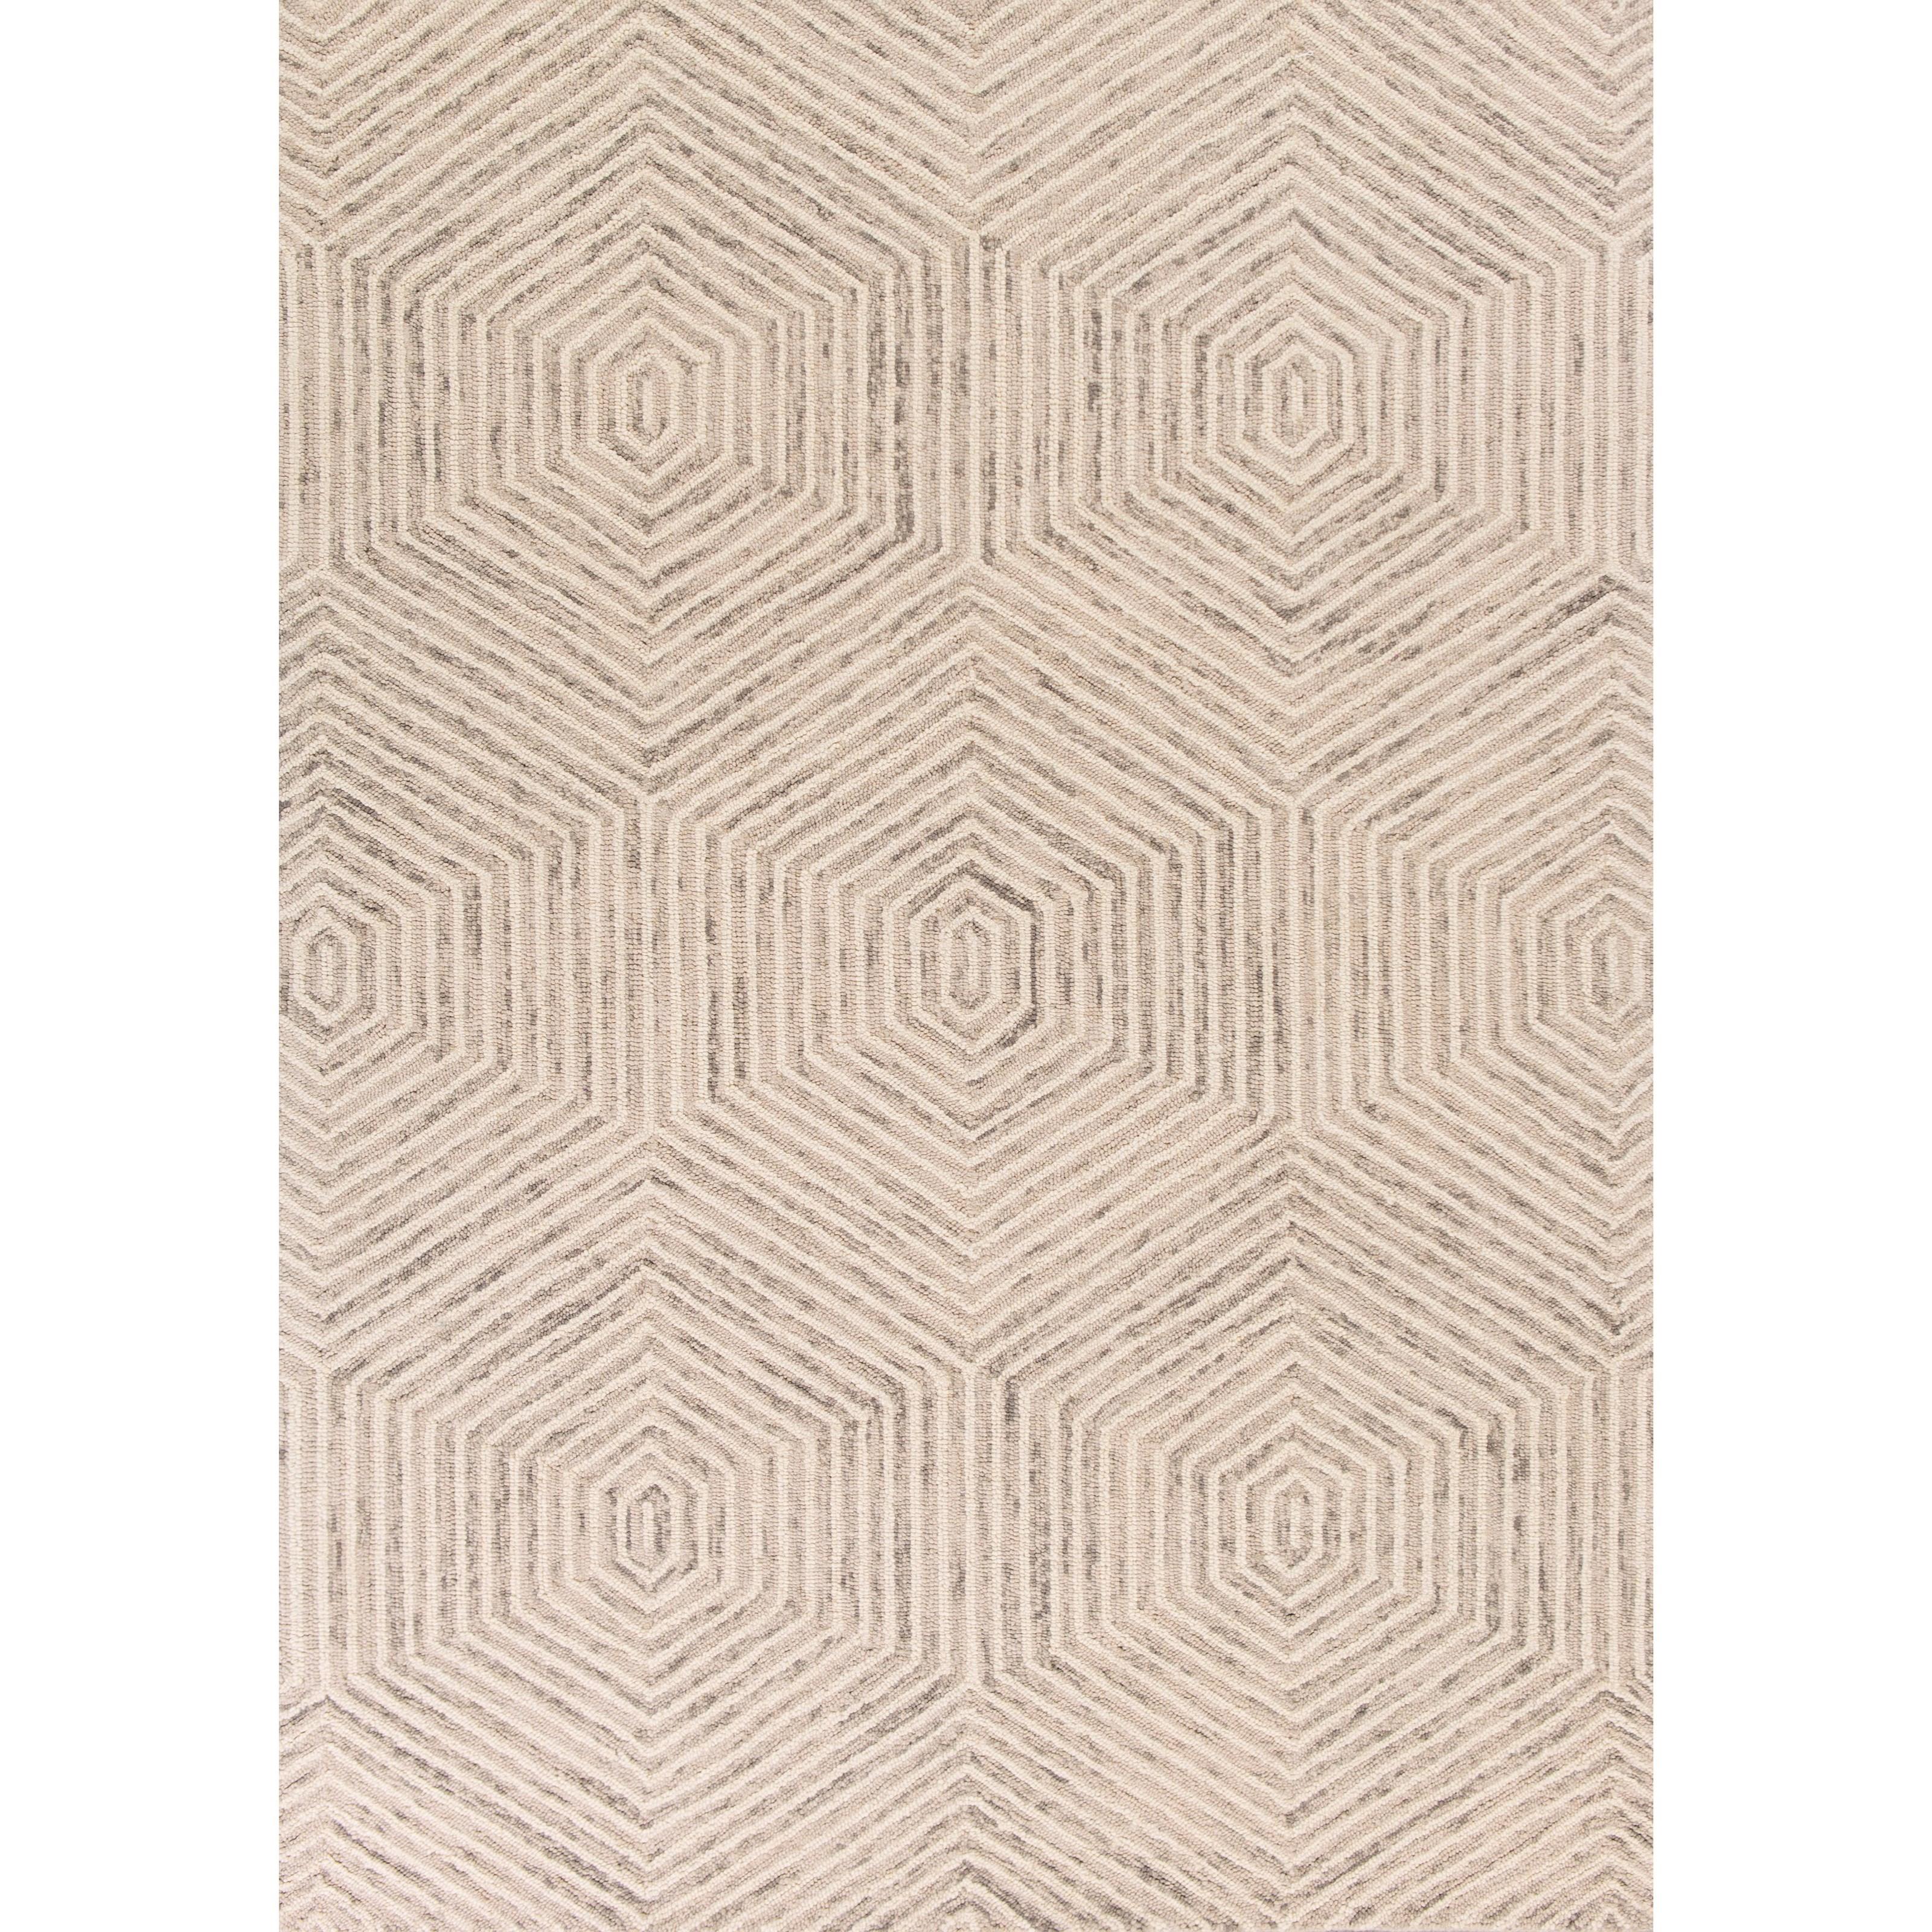 5' X 7' Ivory Honeycomb Area Rug